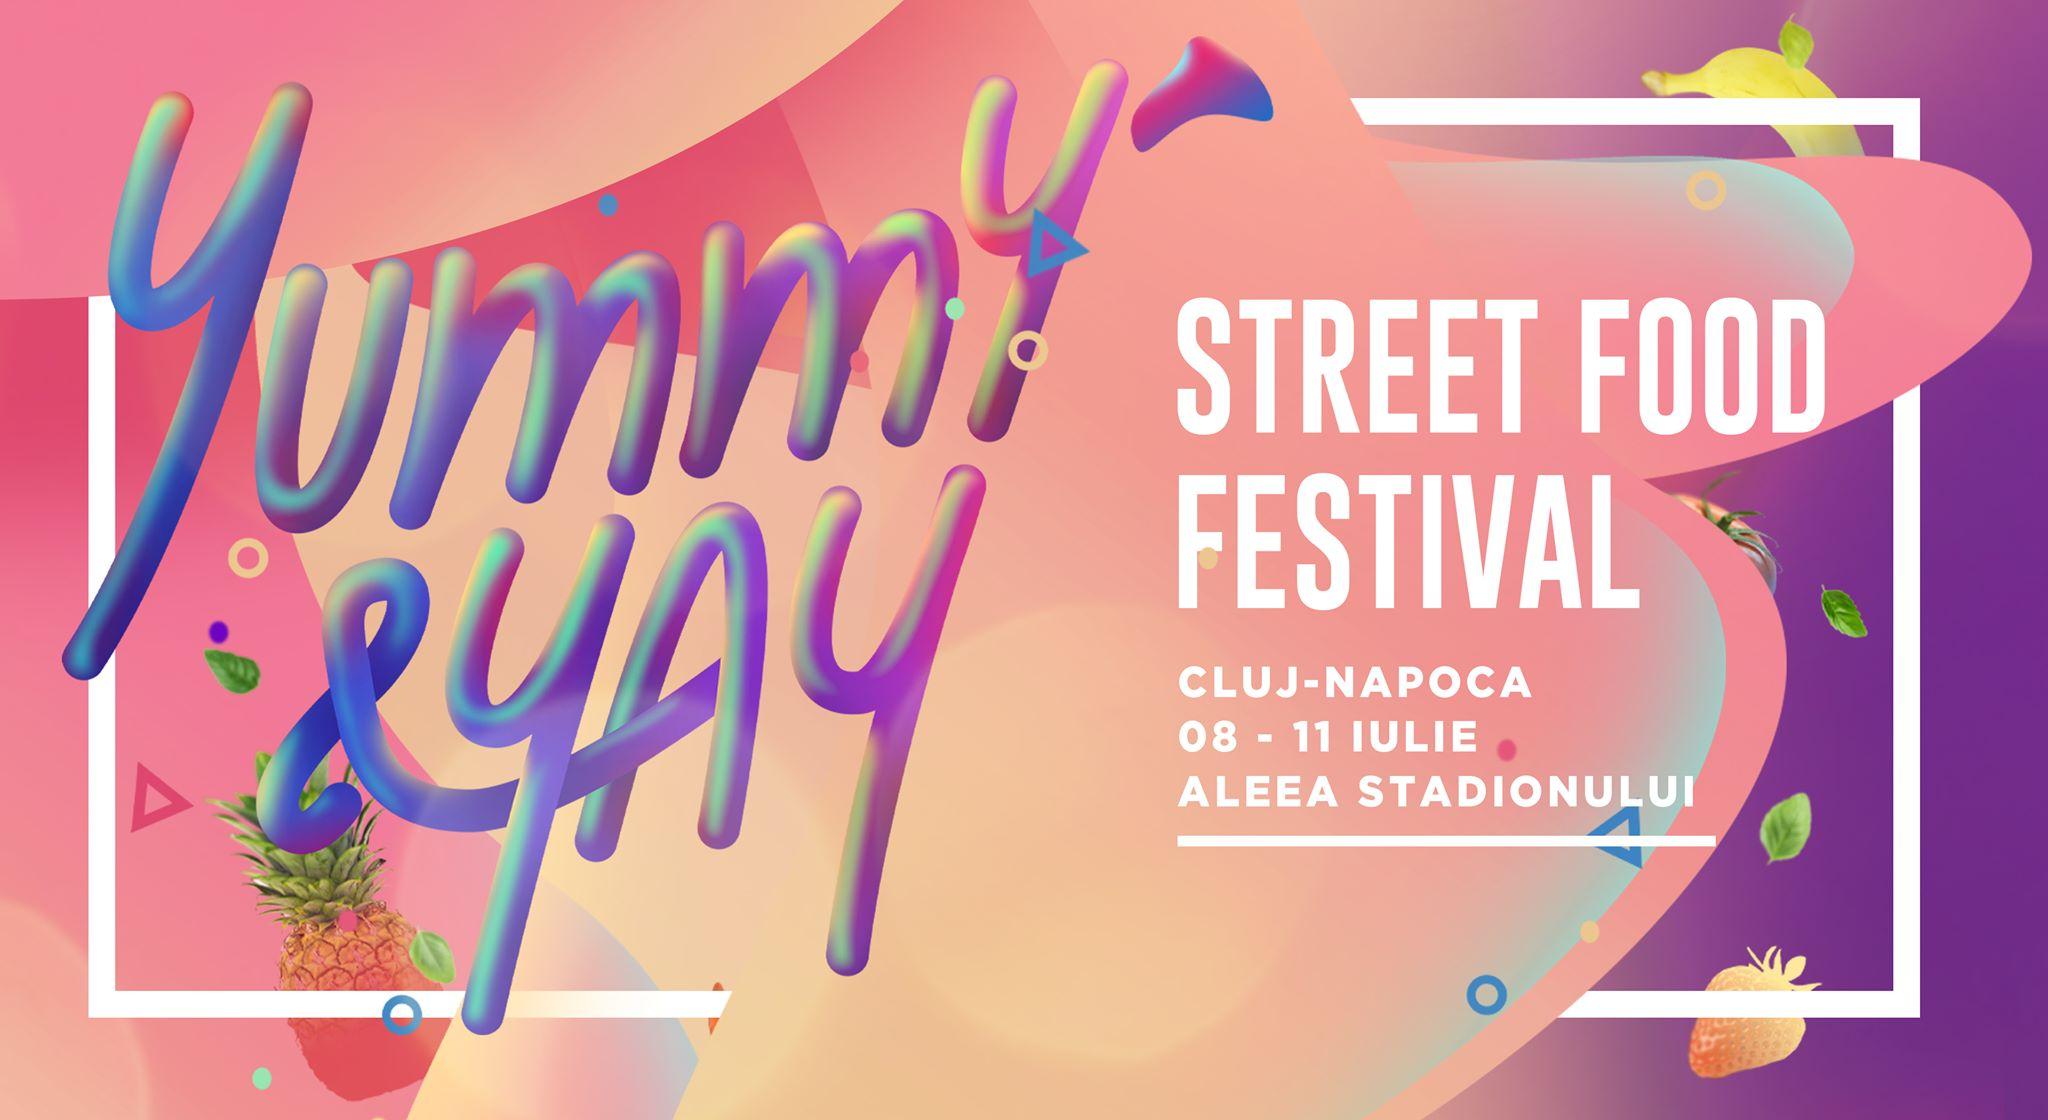 Street FOOD Festival Cluj-Napoca 2021